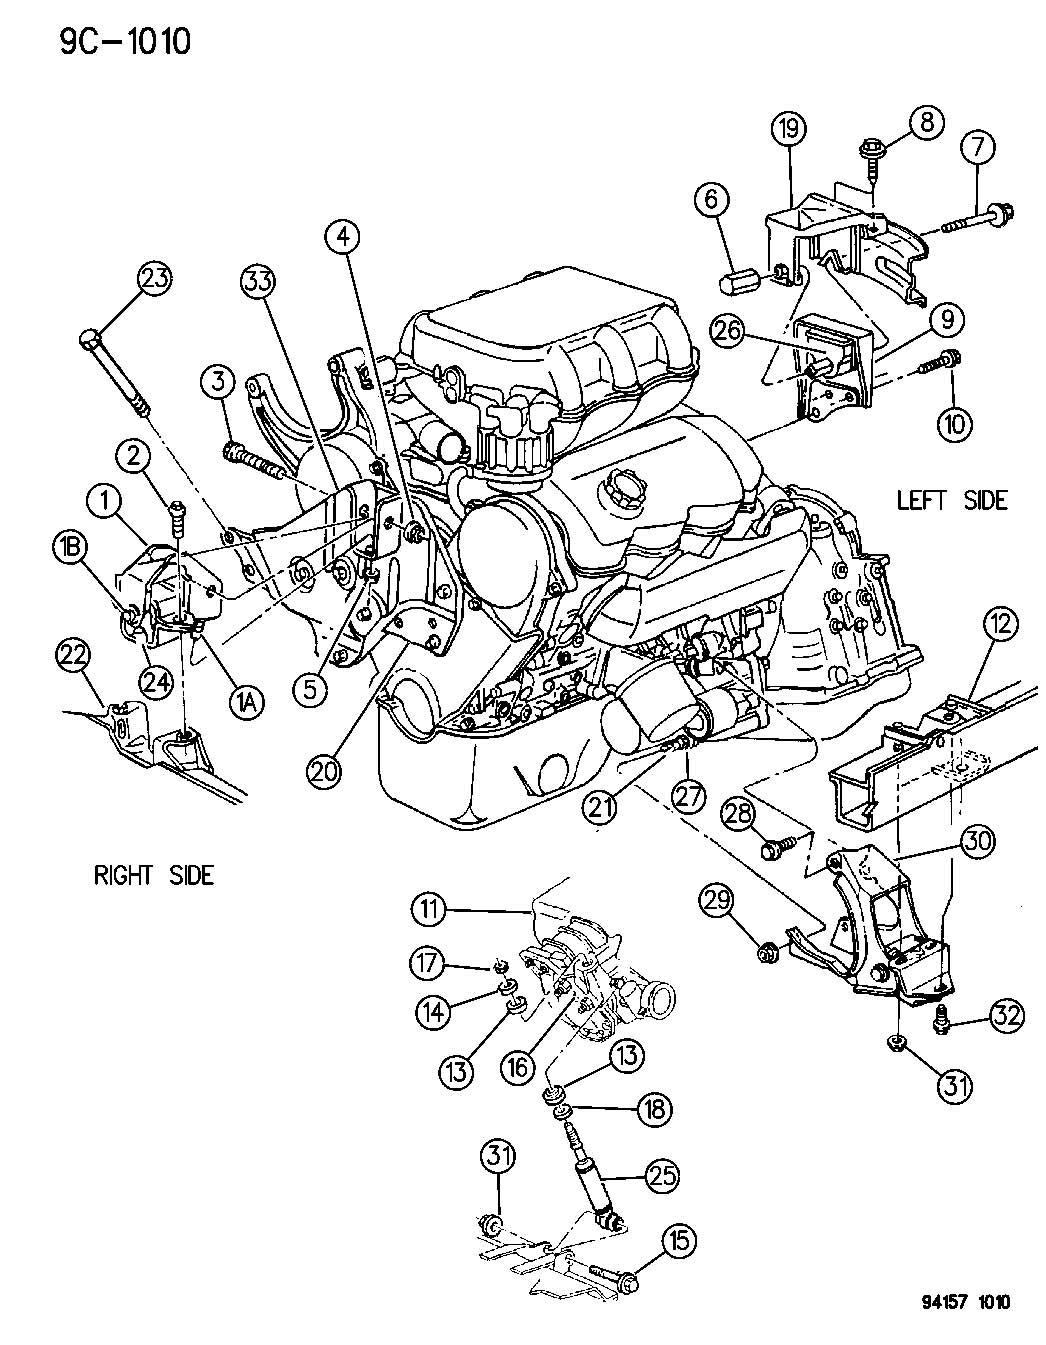 Plymouth Sundance Engine Mounting 3 0 L Engine